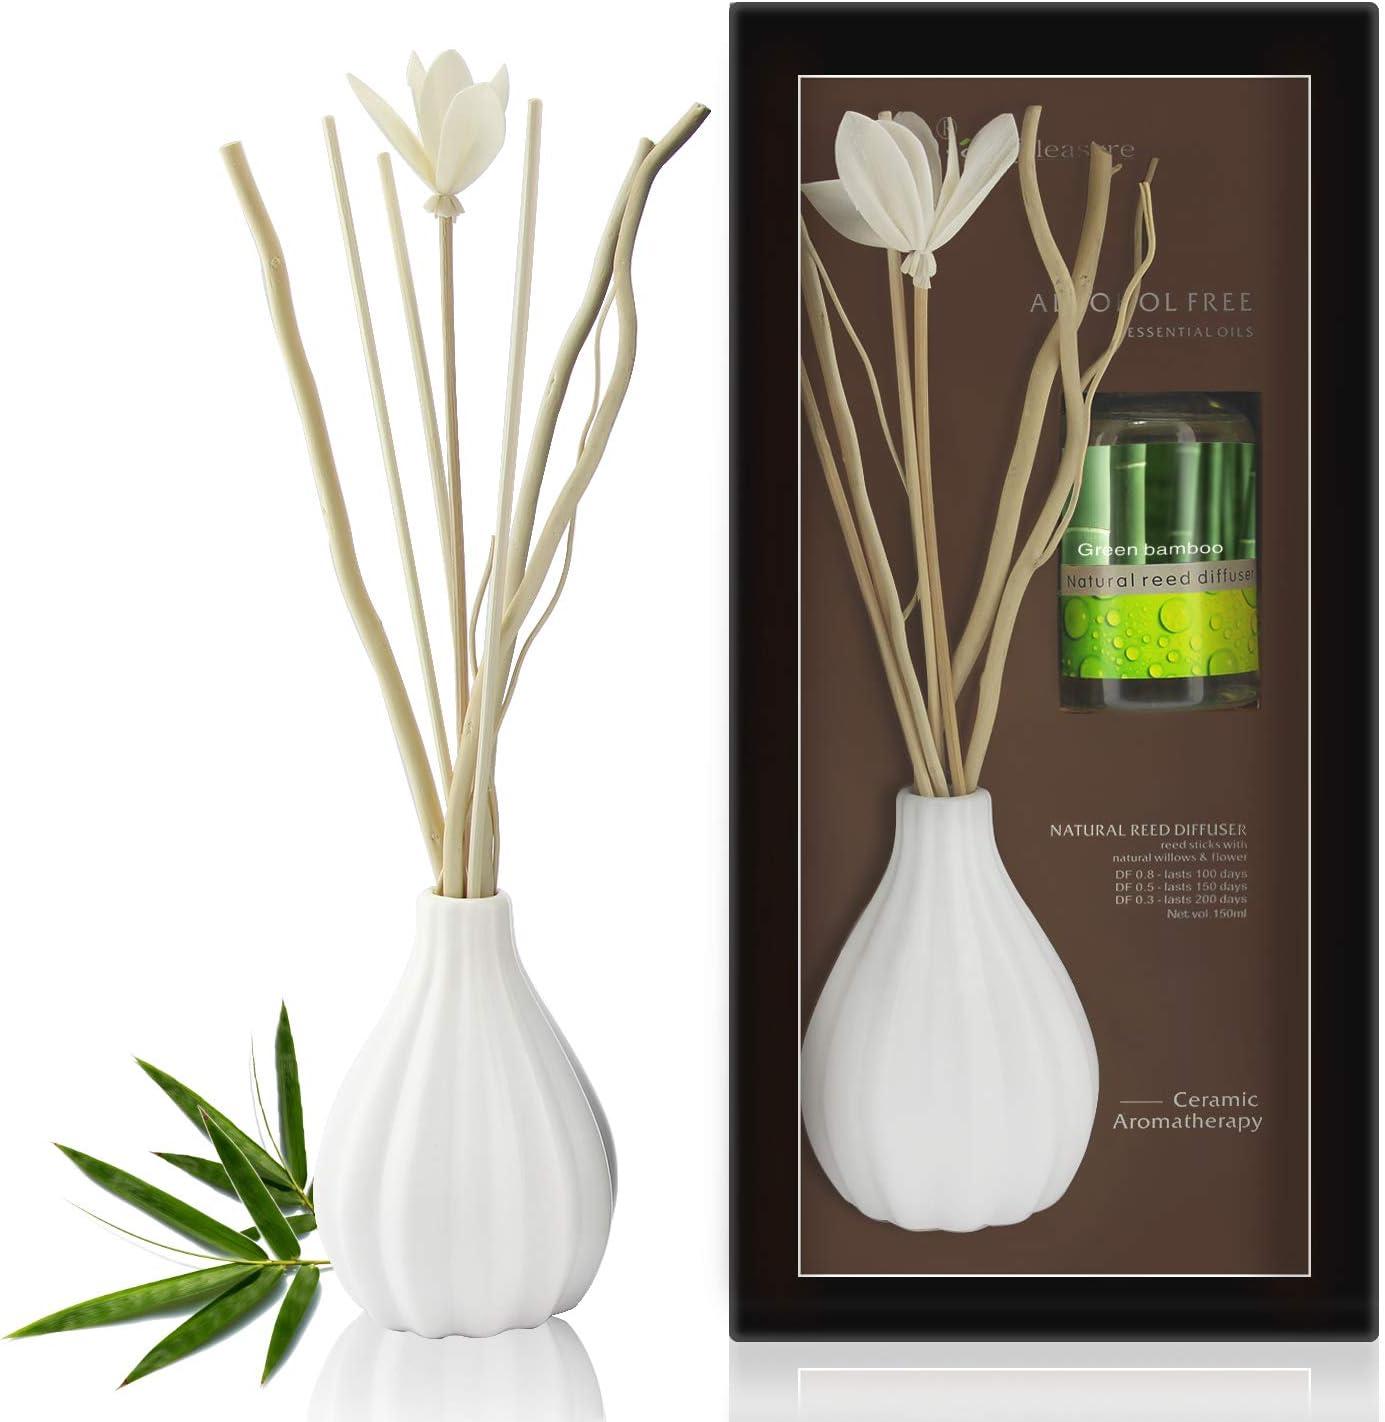 ap Sales airpleasure Reed Arlington Mall Diffuser Set Fragrance Home Decorative Di